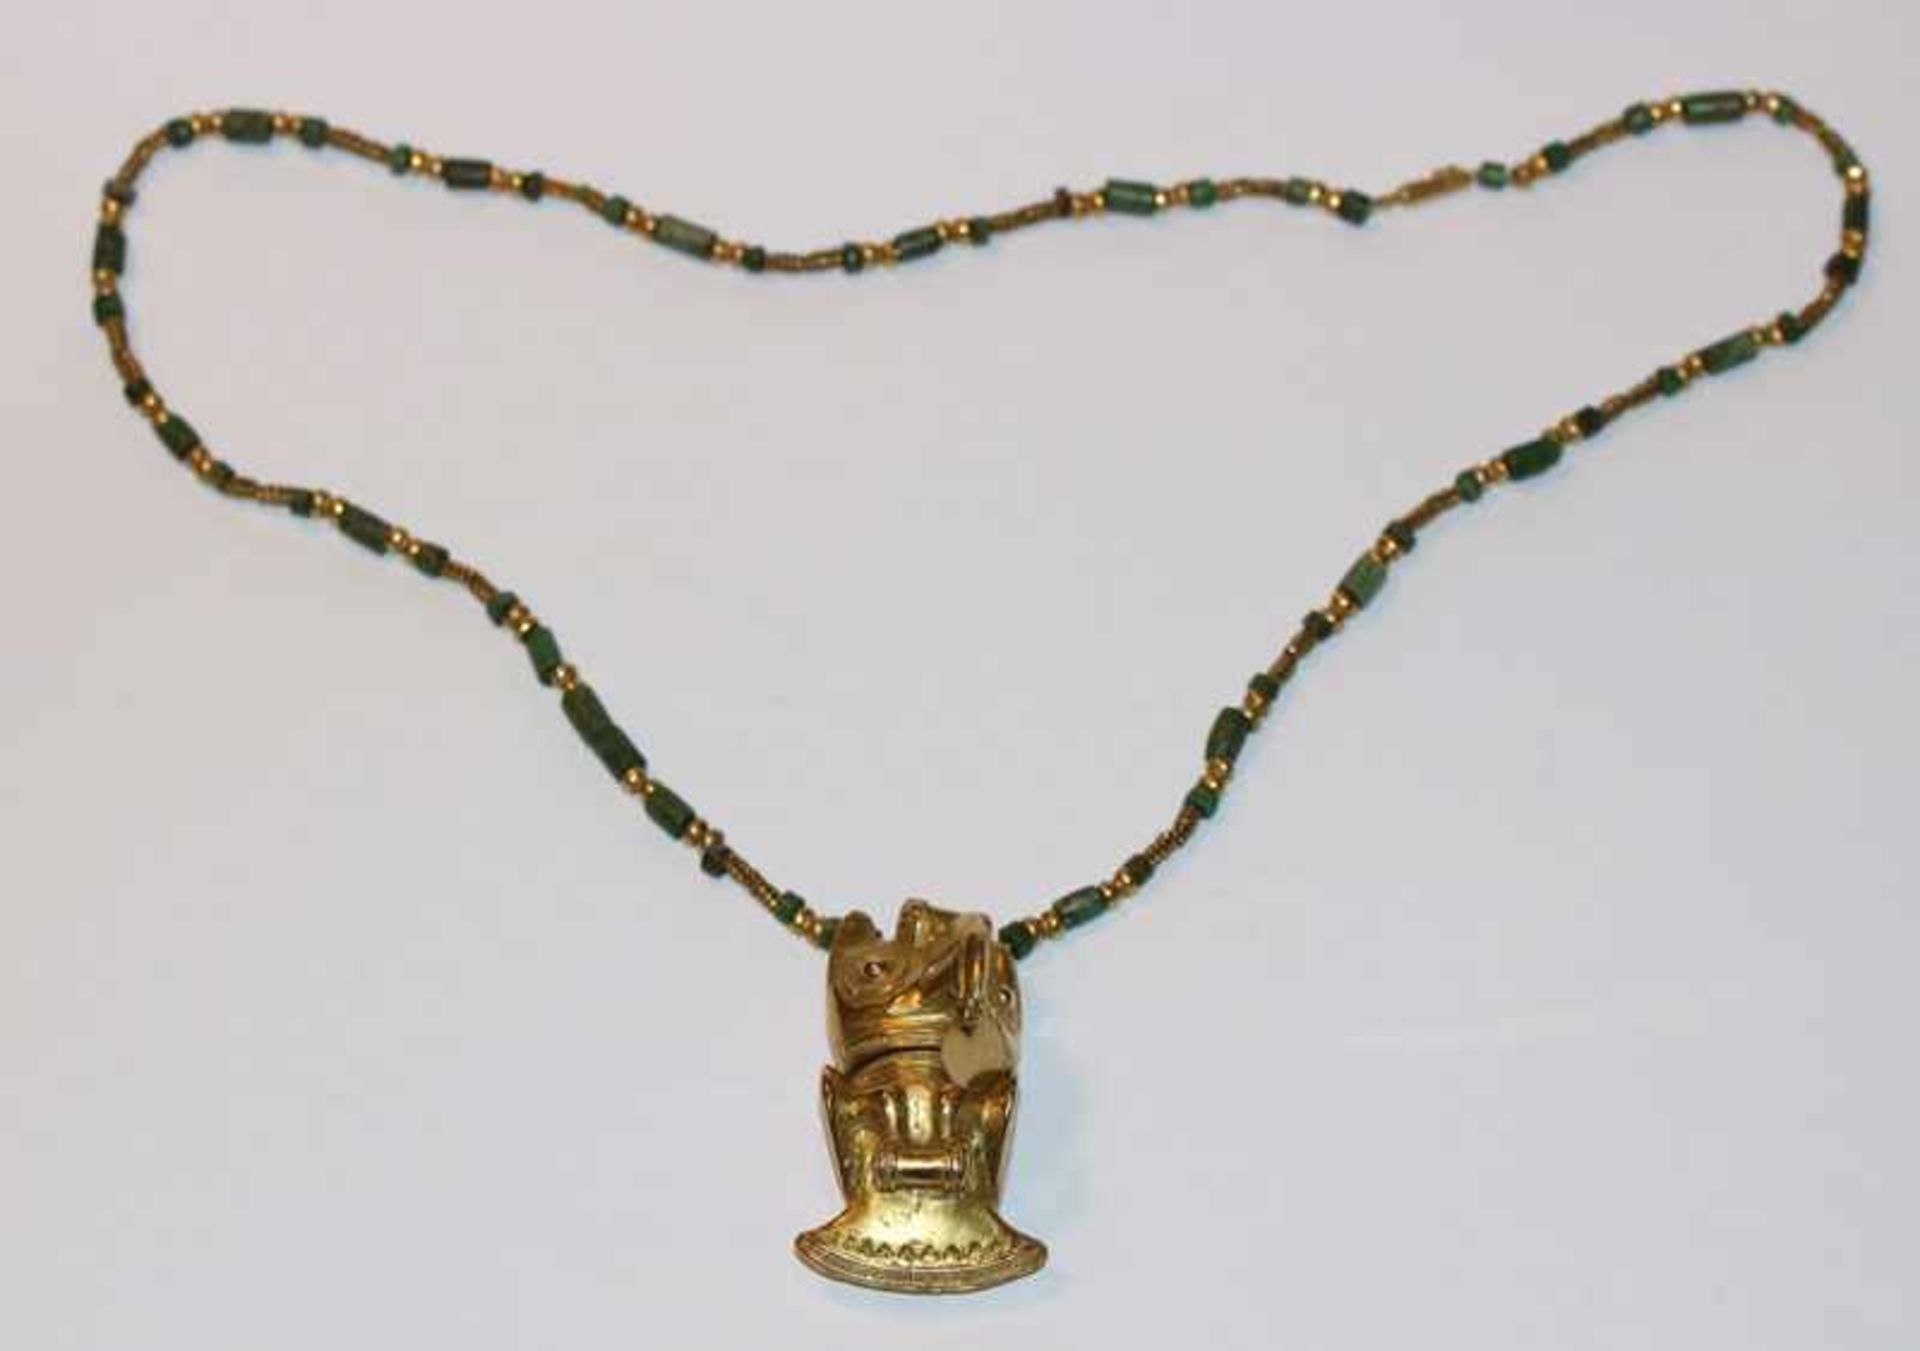 18 k Gelbgold Kultobjekt Uhu, Replik, Tairuna, Kolumbien, an grüner Steinkette mit Gold-